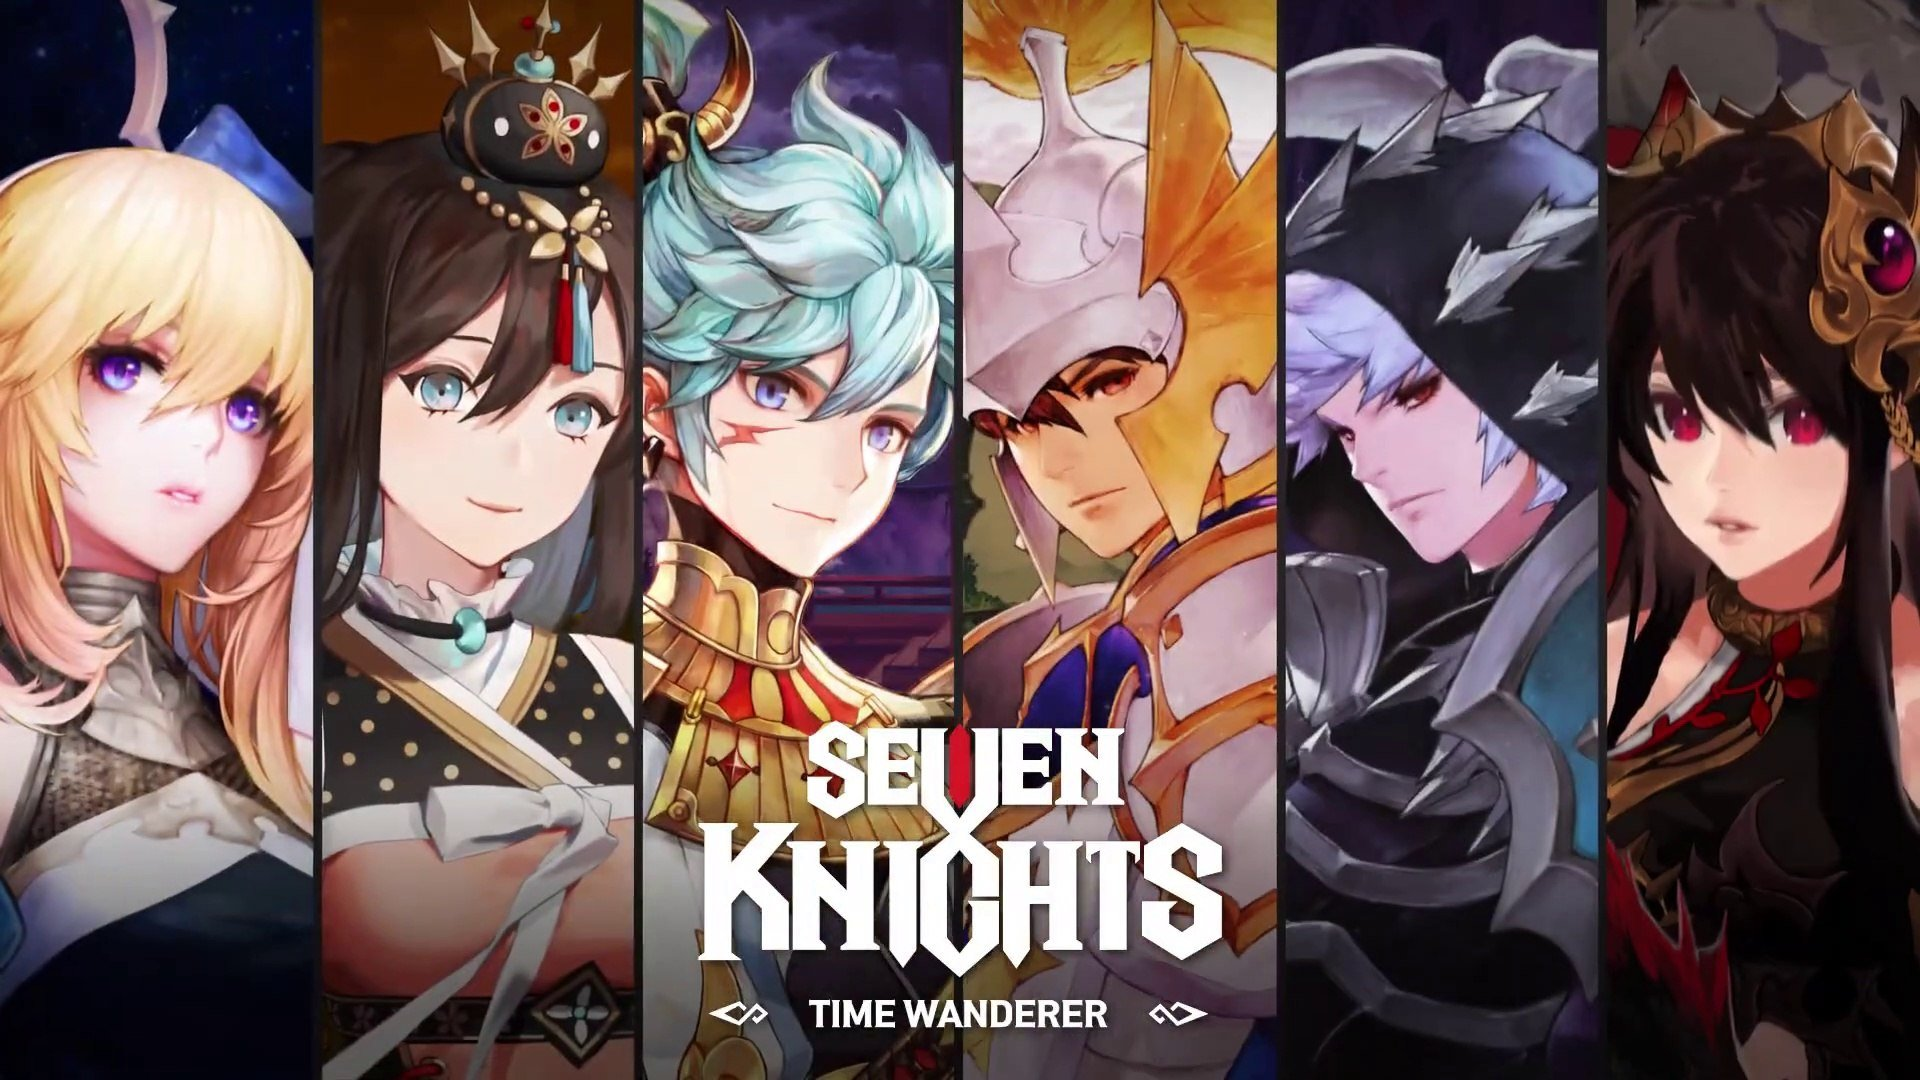 Seven Knights Anime Adaptation